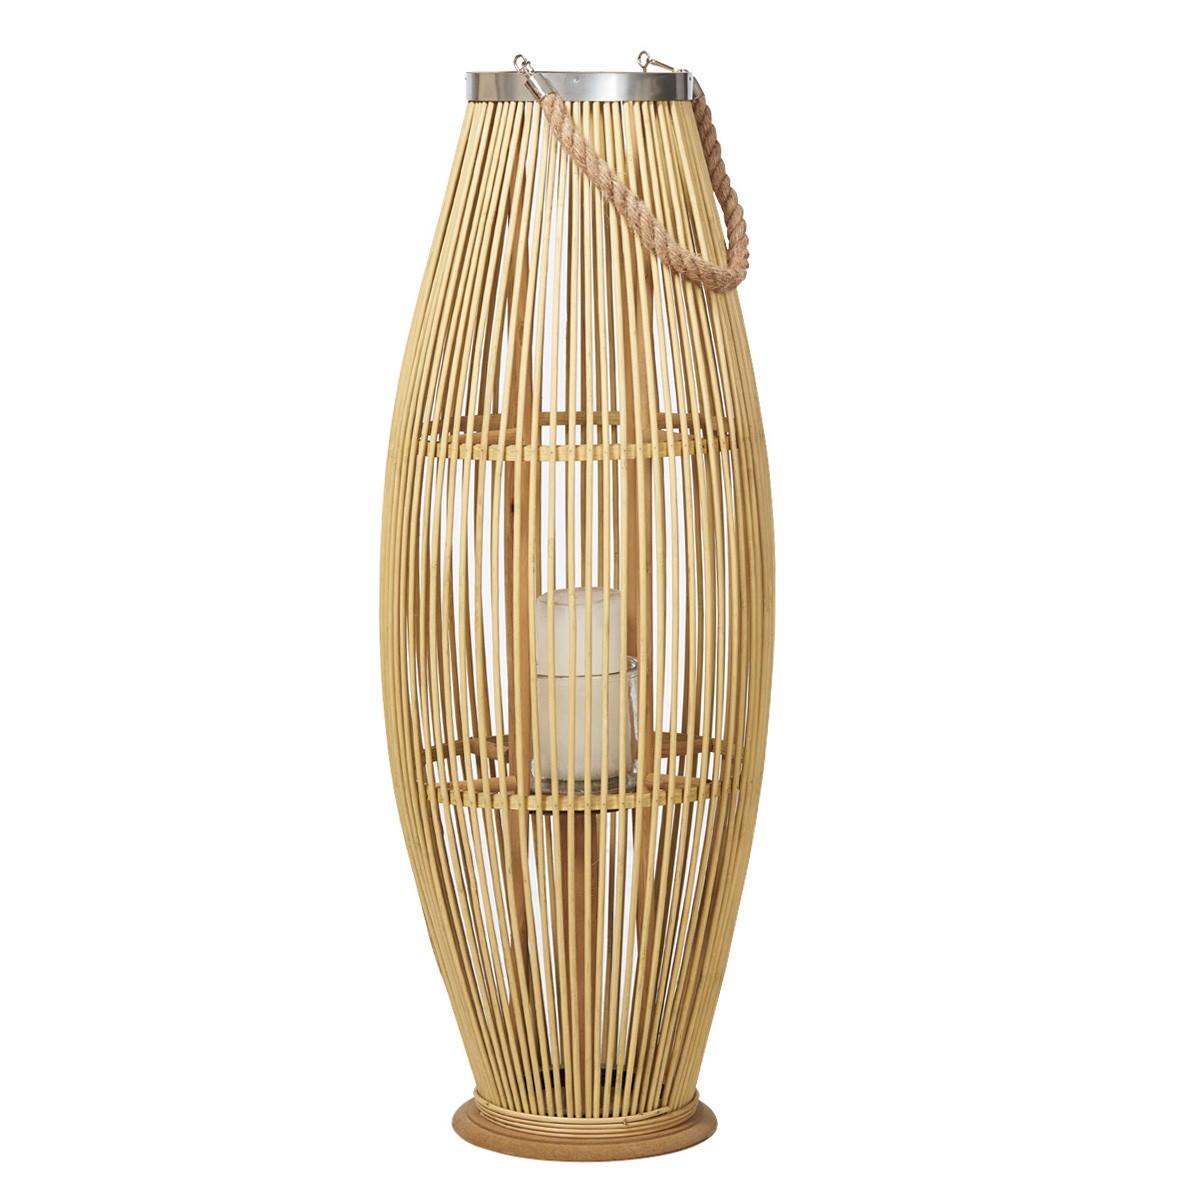 Hanoi Bamboo Floor Lantern, Large, Natural